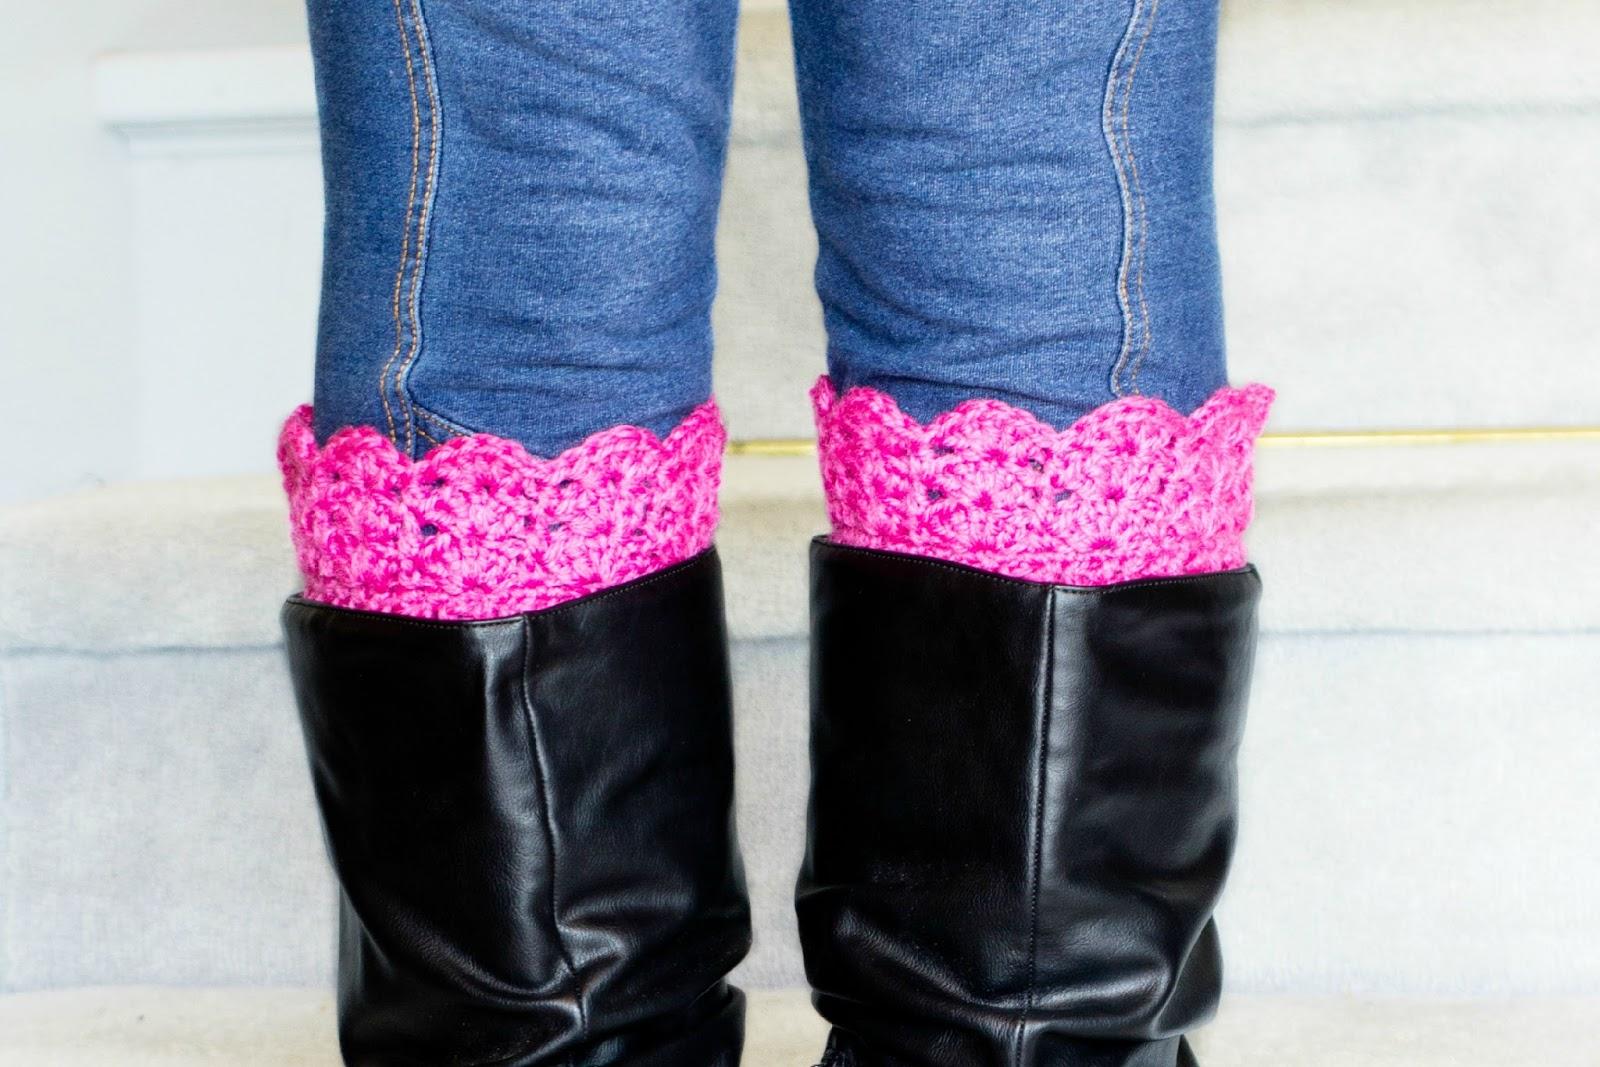 http://4.bp.blogspot.com/-Bm41_lY9C7s/Uuep1Oxy74I/AAAAAAAAGhA/m51hC7m4FM8/s1600/Vintage+Inspired+Boot+Cuffs+Crochet+Pattern+4.jpg